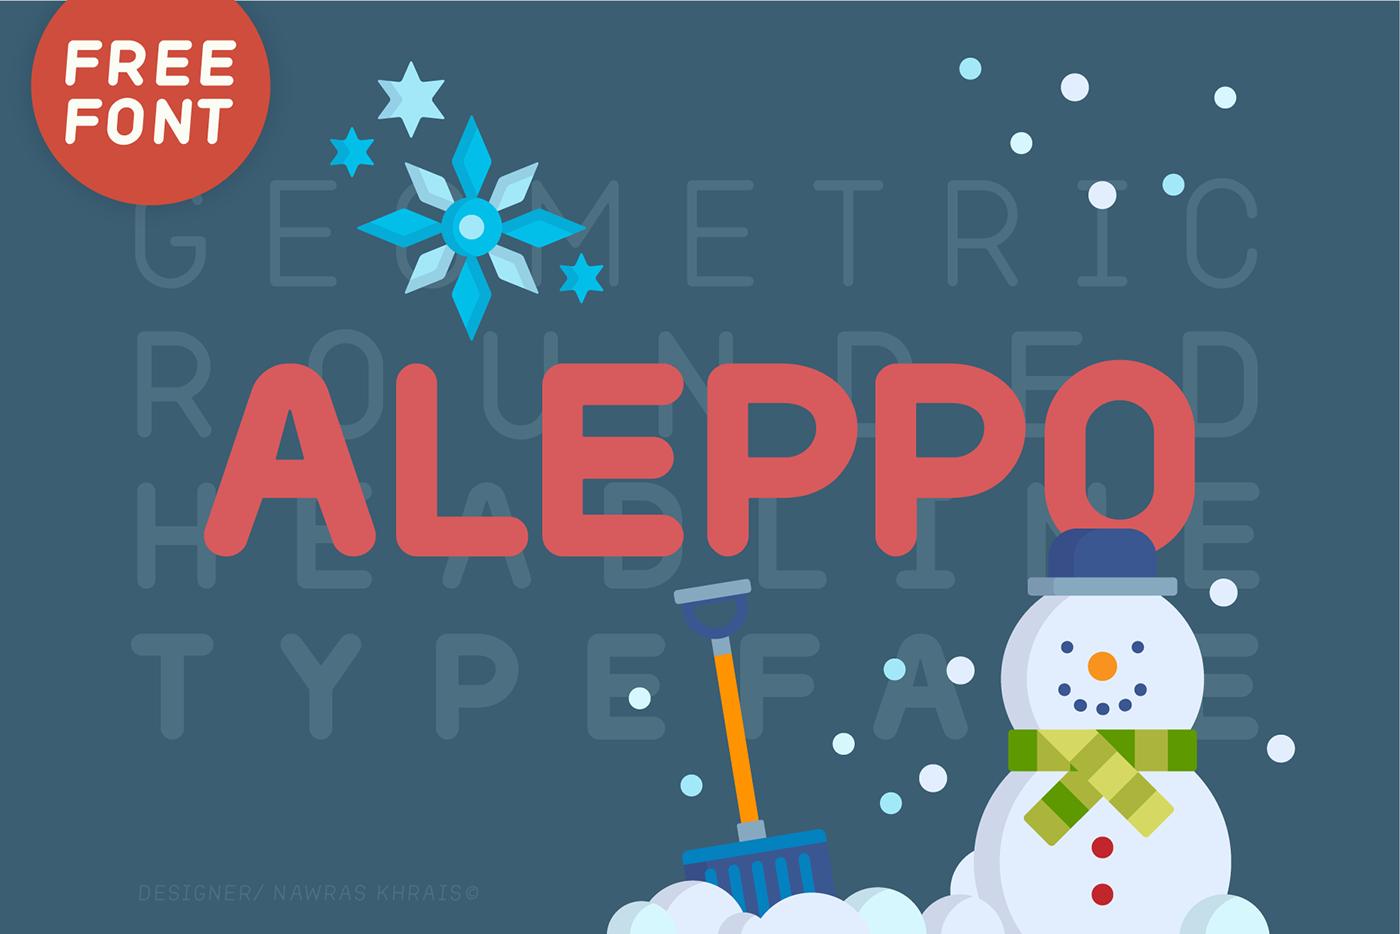 Adobe Portfolio typography   graphic design